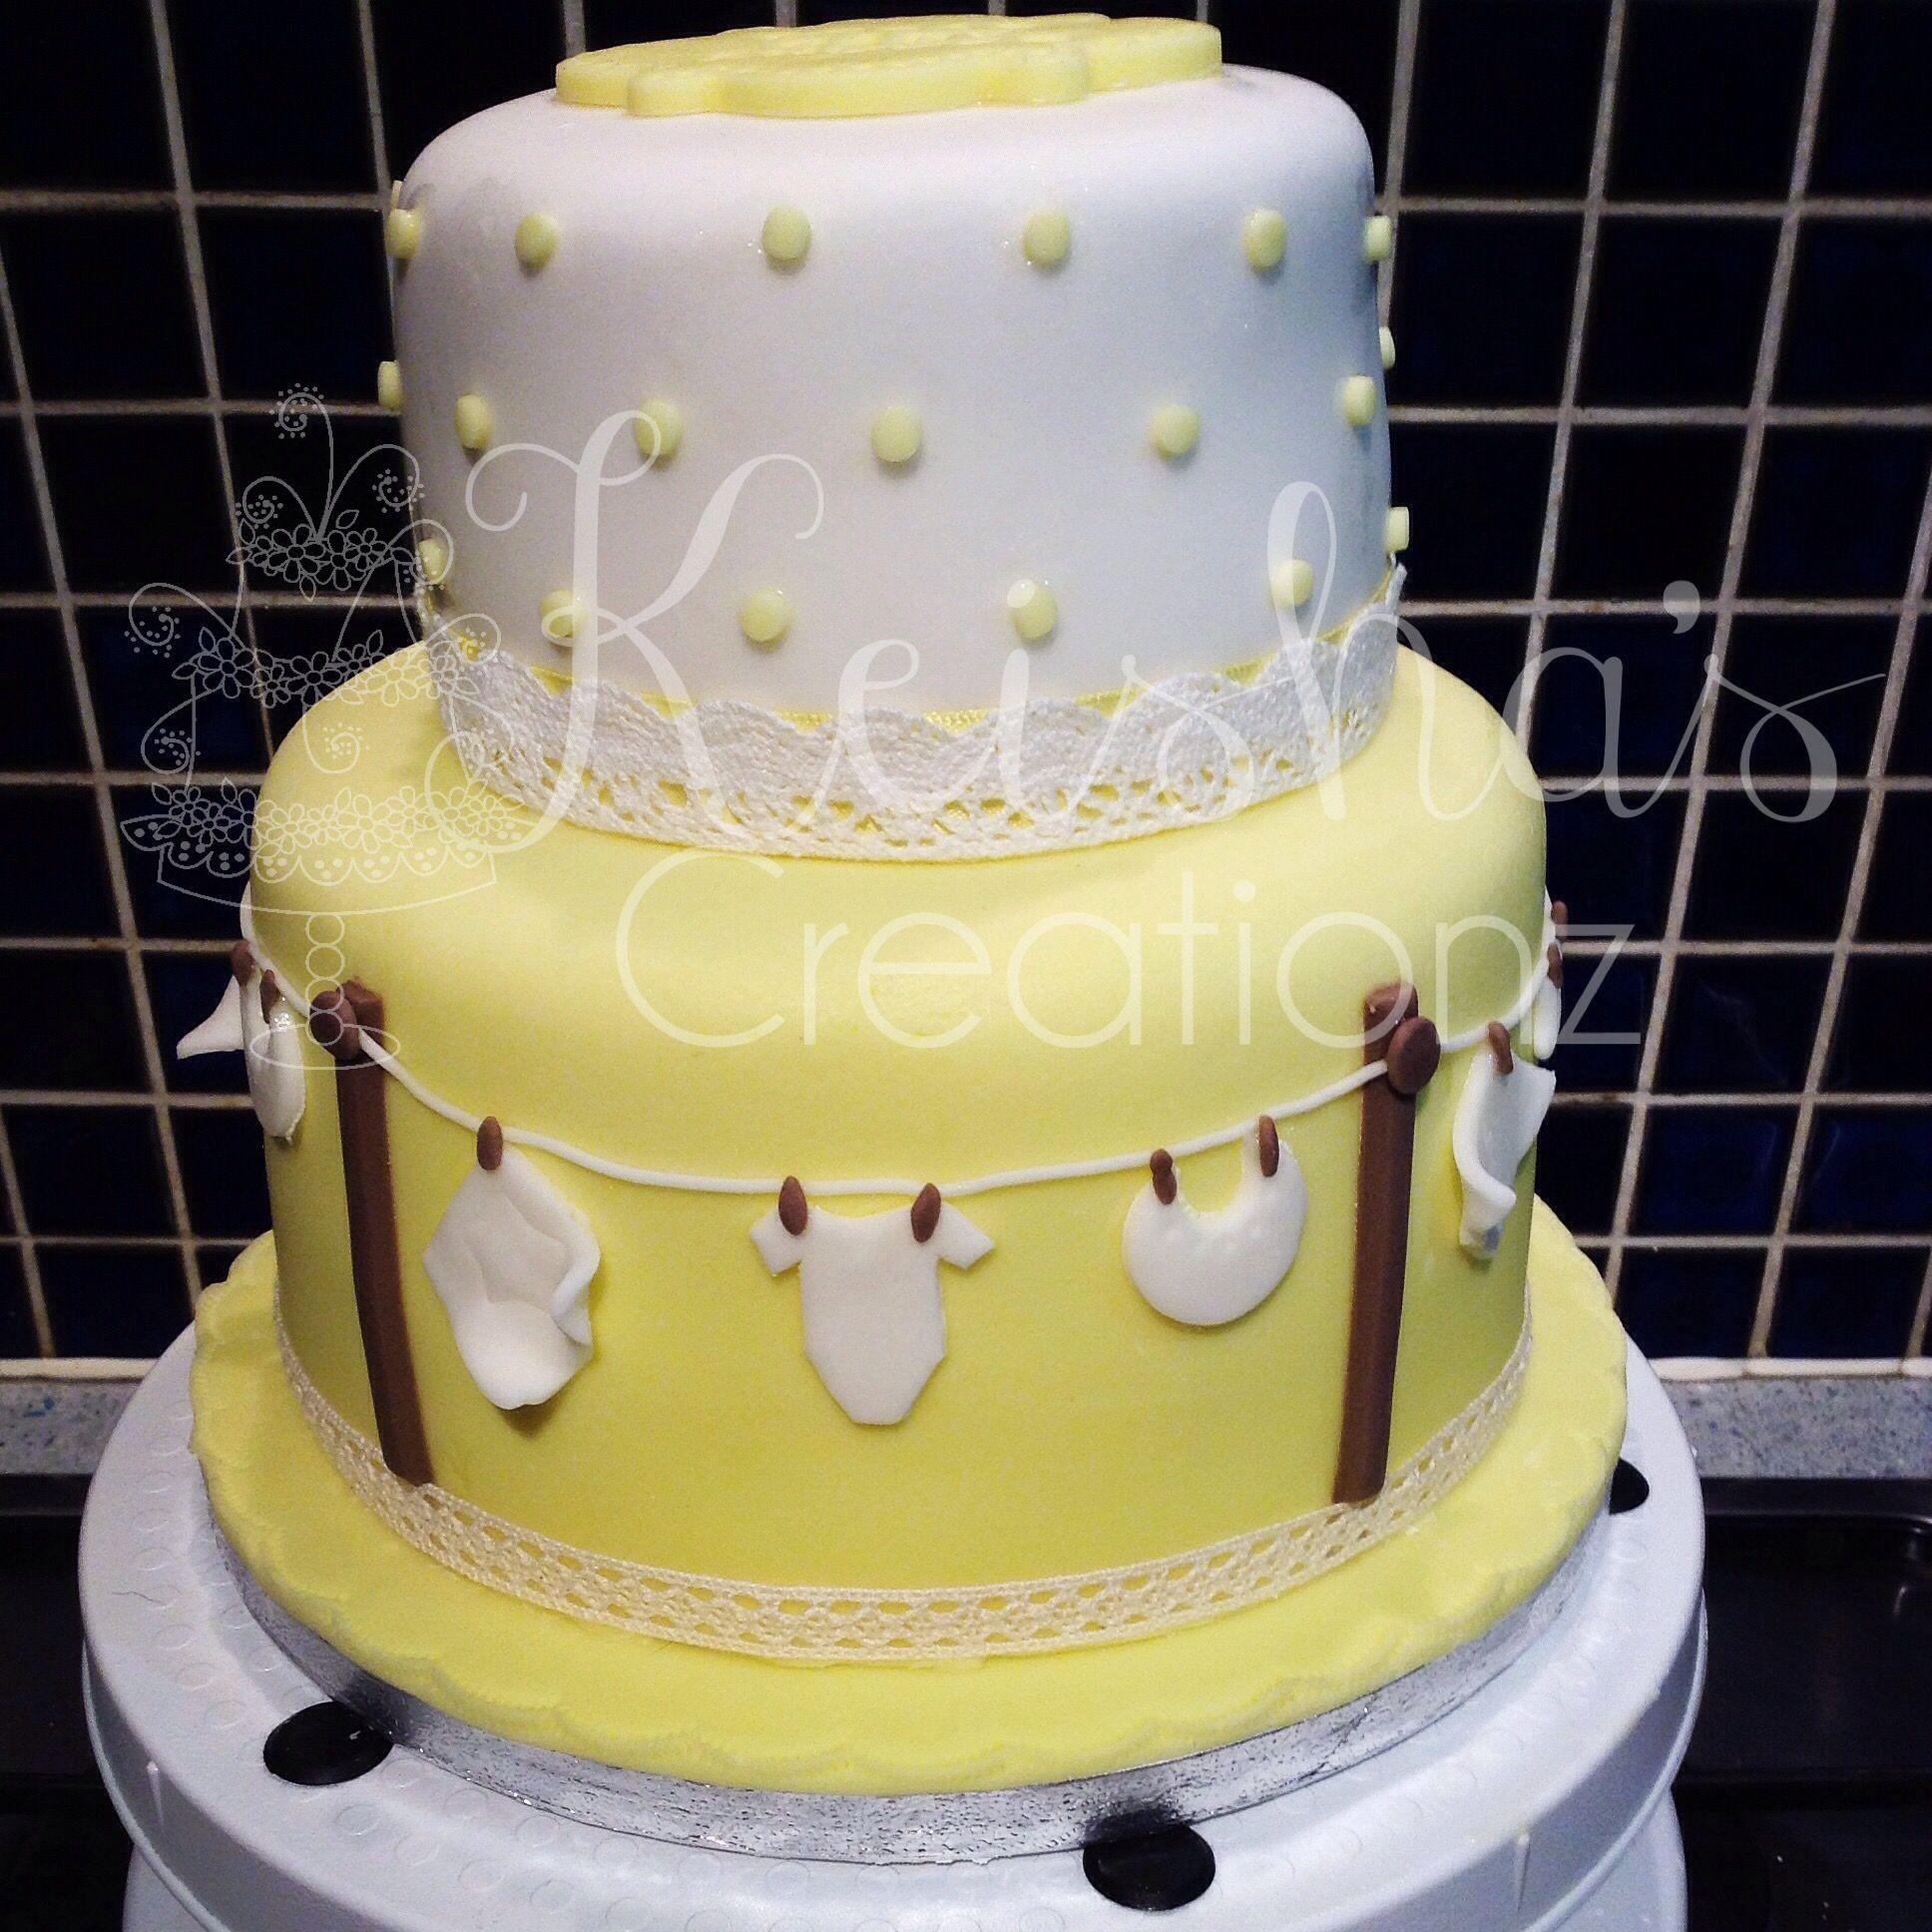 2 Tier Gender Neutral Baby Shower Cake By Keisha S Creationz Featuring Miniature Washing Line And Baby Clothes Baby Shower Cakes Cupcake Cakes Cake